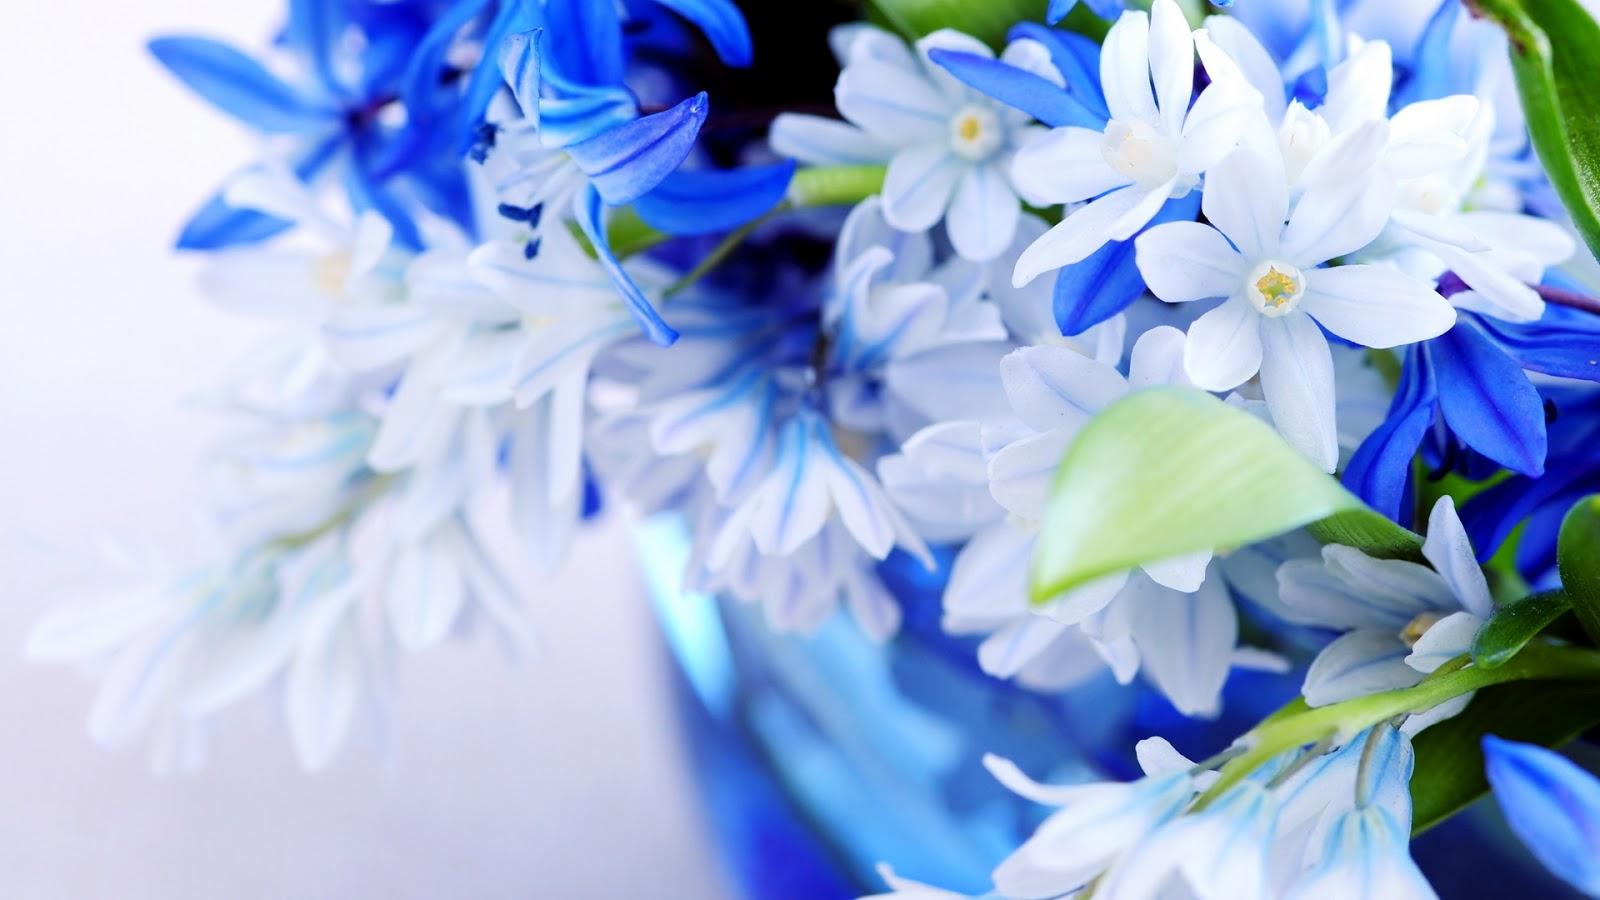 flowers for flower lovers Beautiful flowers desktop wallpapers 1600x900